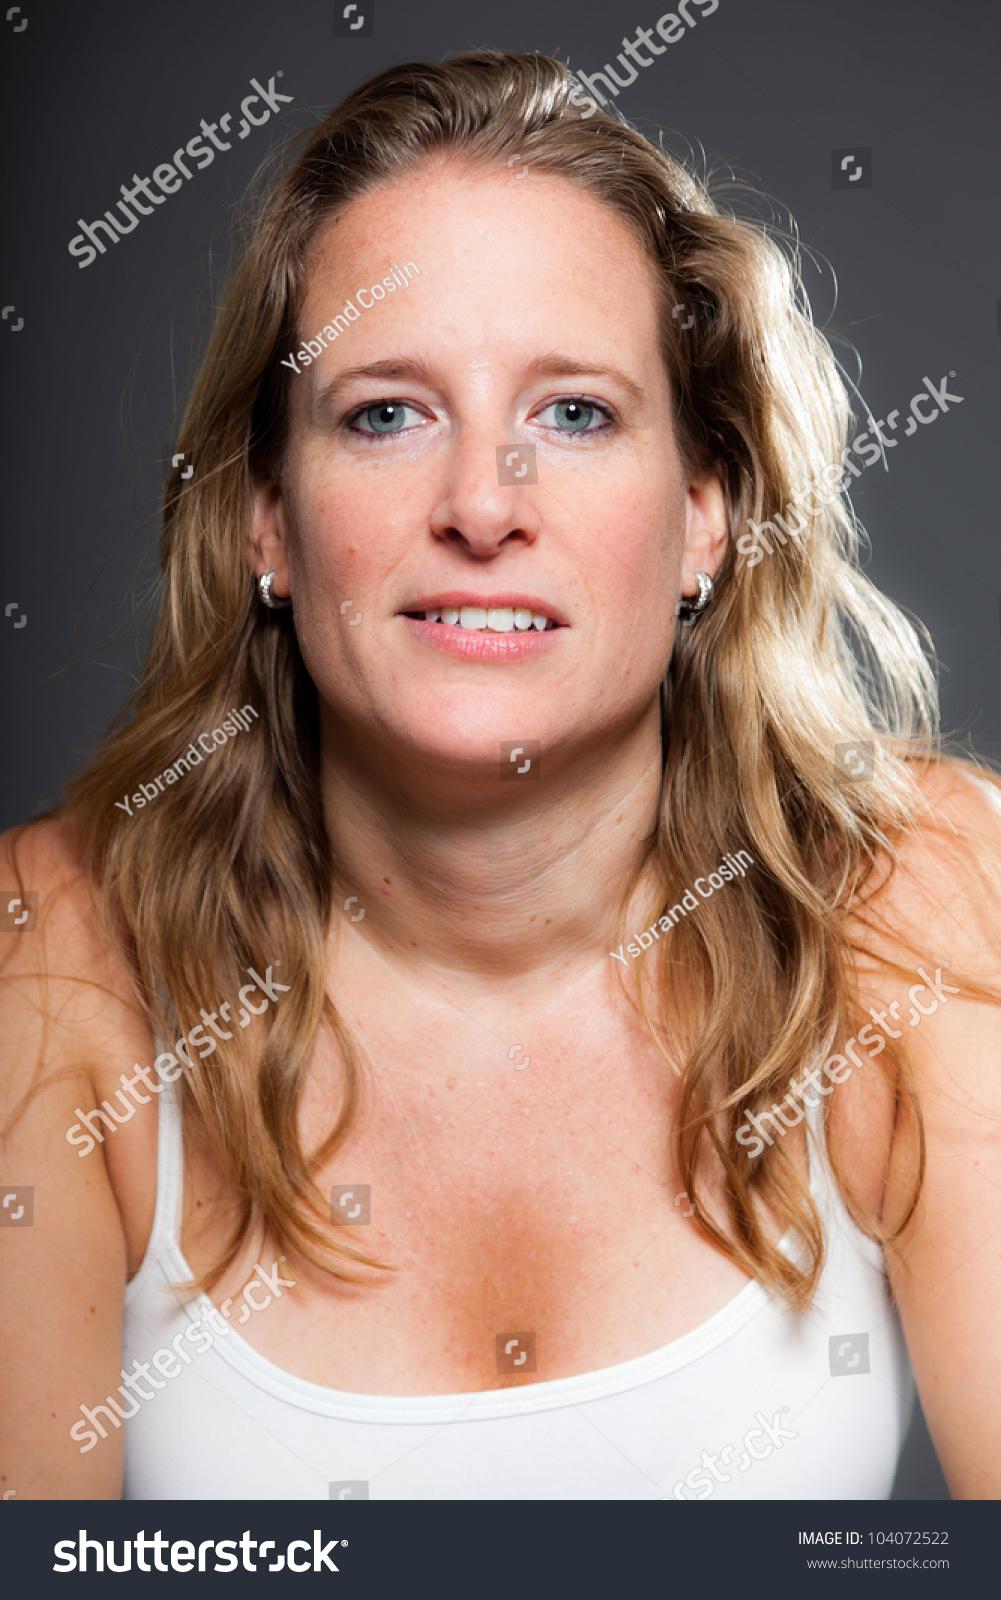 Paparazzi Shona Mcgarty nudes (22 photo), Pussy, Bikini, Feet, cameltoe 2018